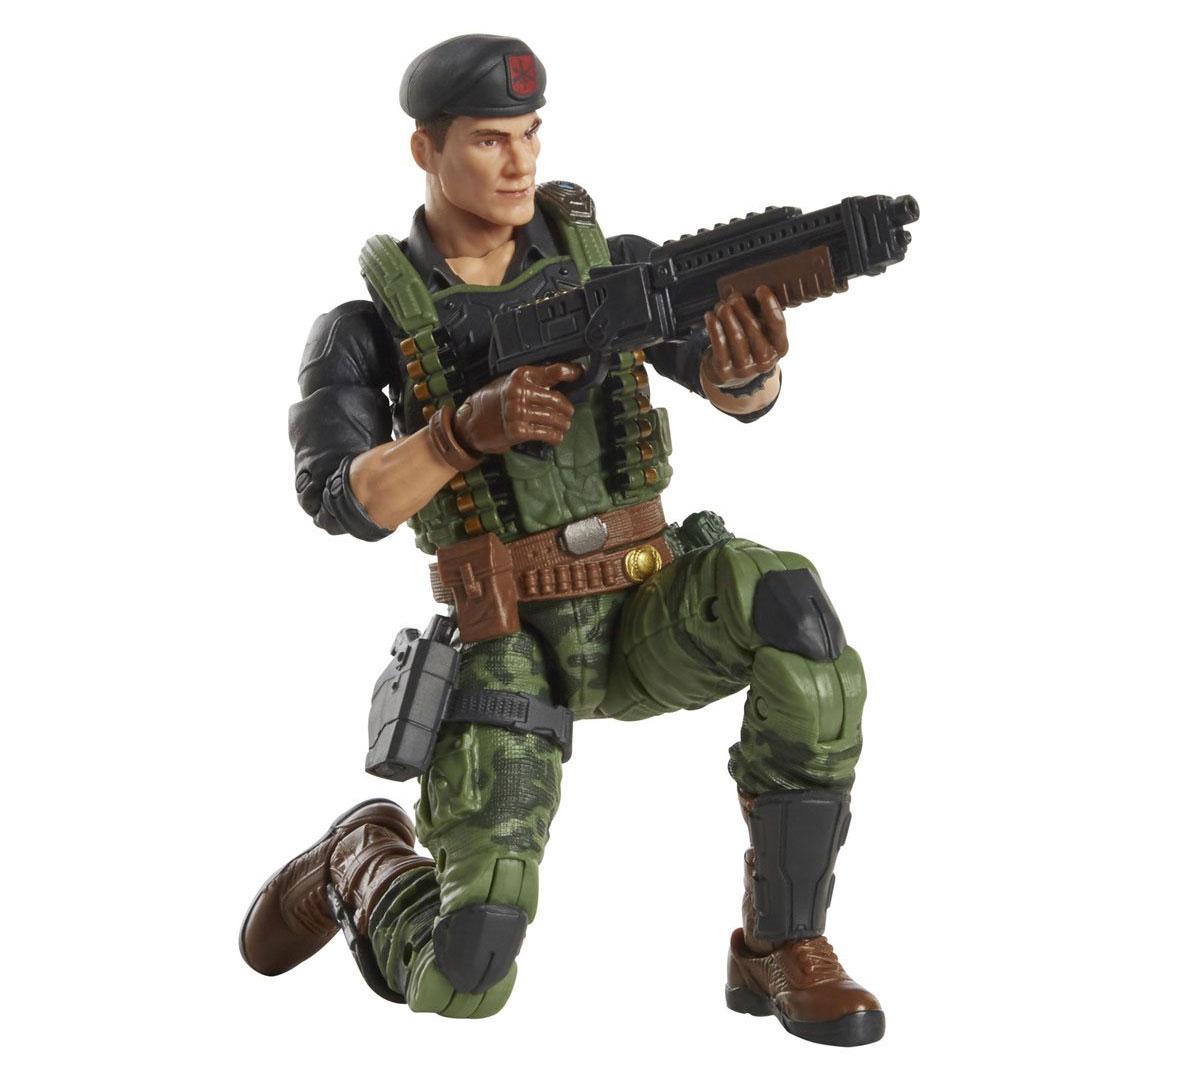 gi-joe-classified-series-flint-action-figure-6